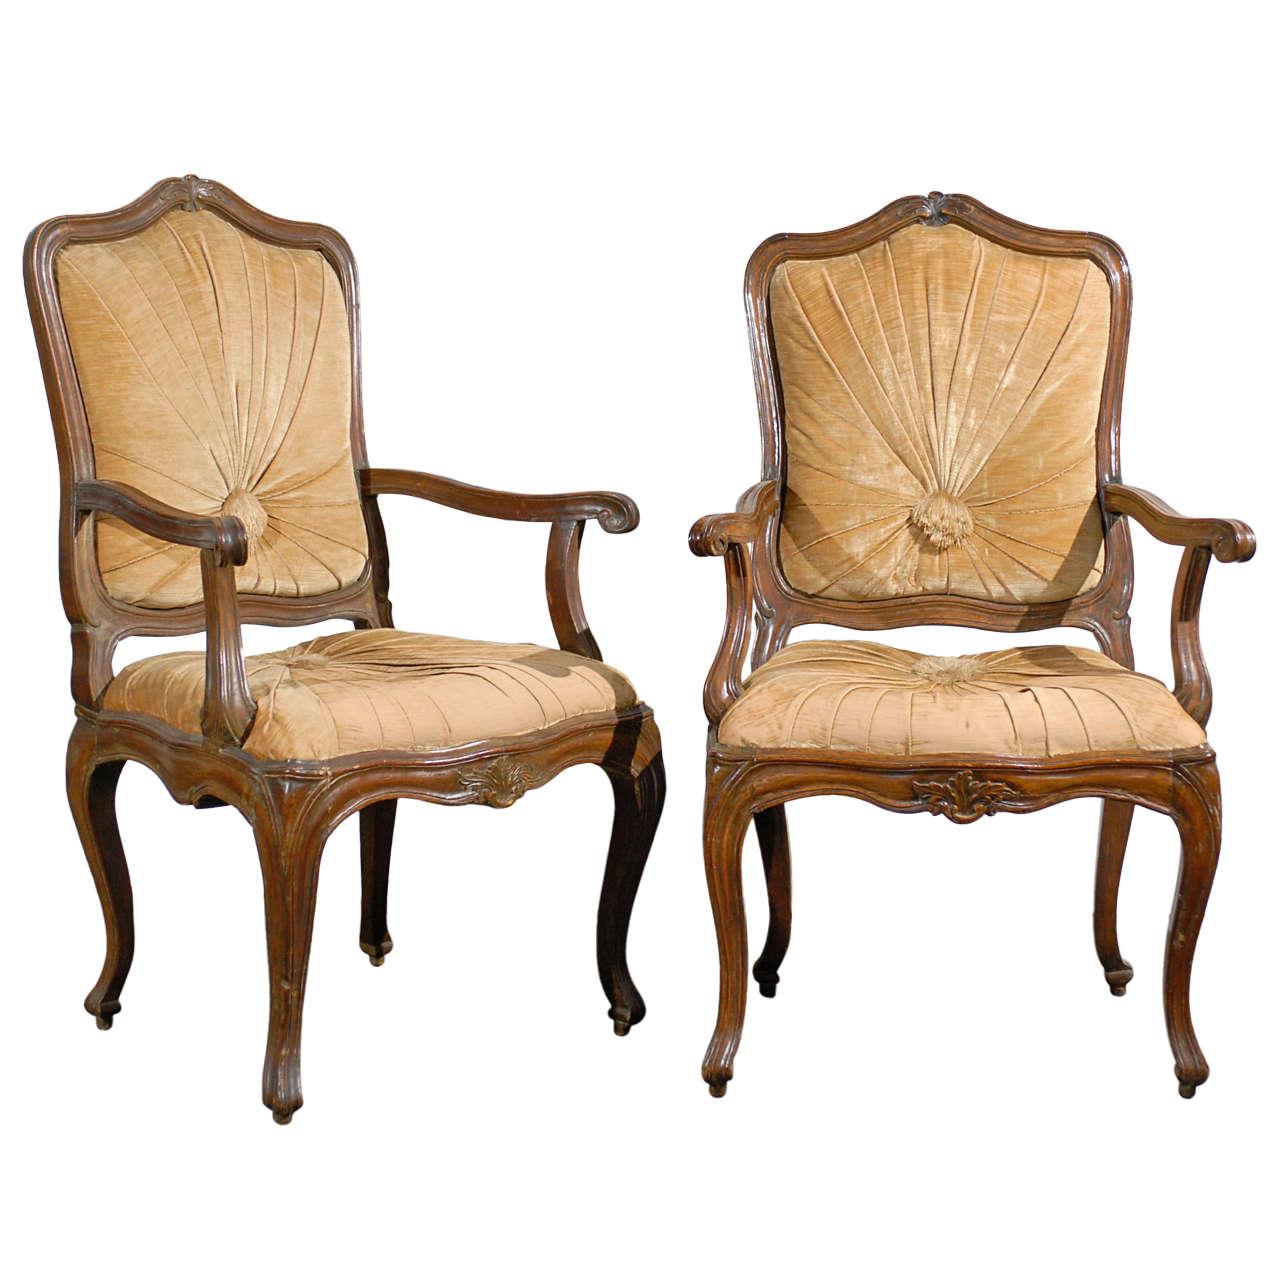 A Pair of 19th Century Italian Walnut Chairs